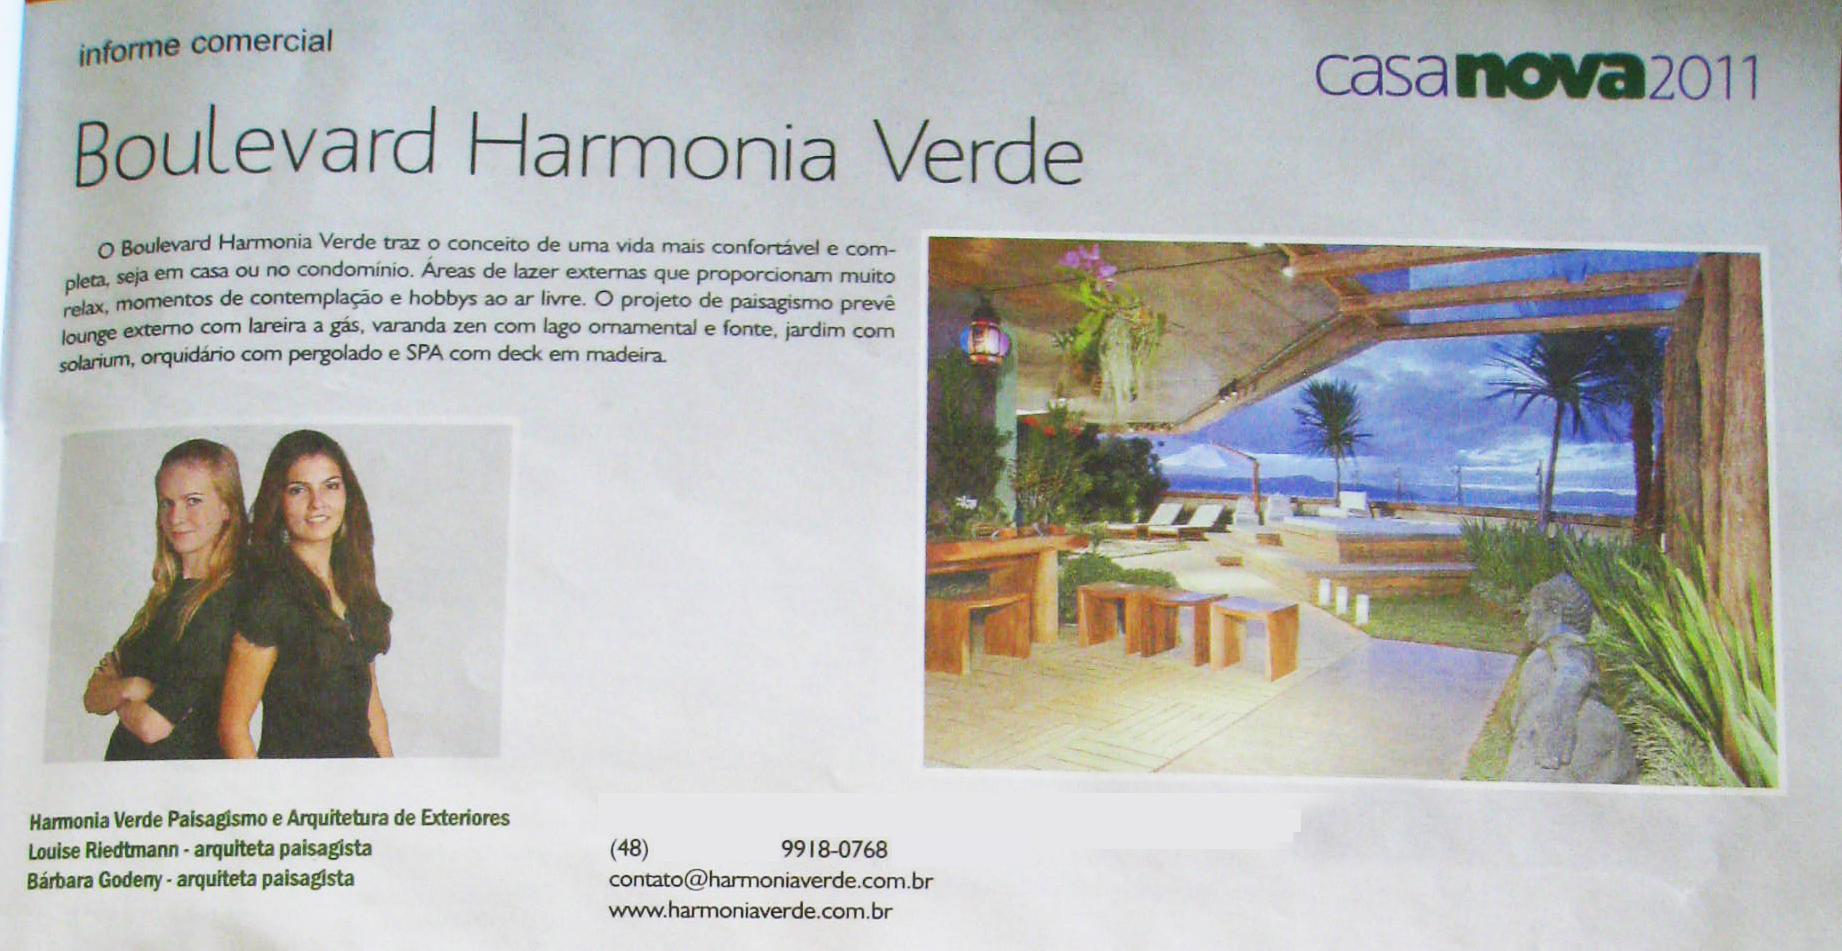 boulevard harmonia verde